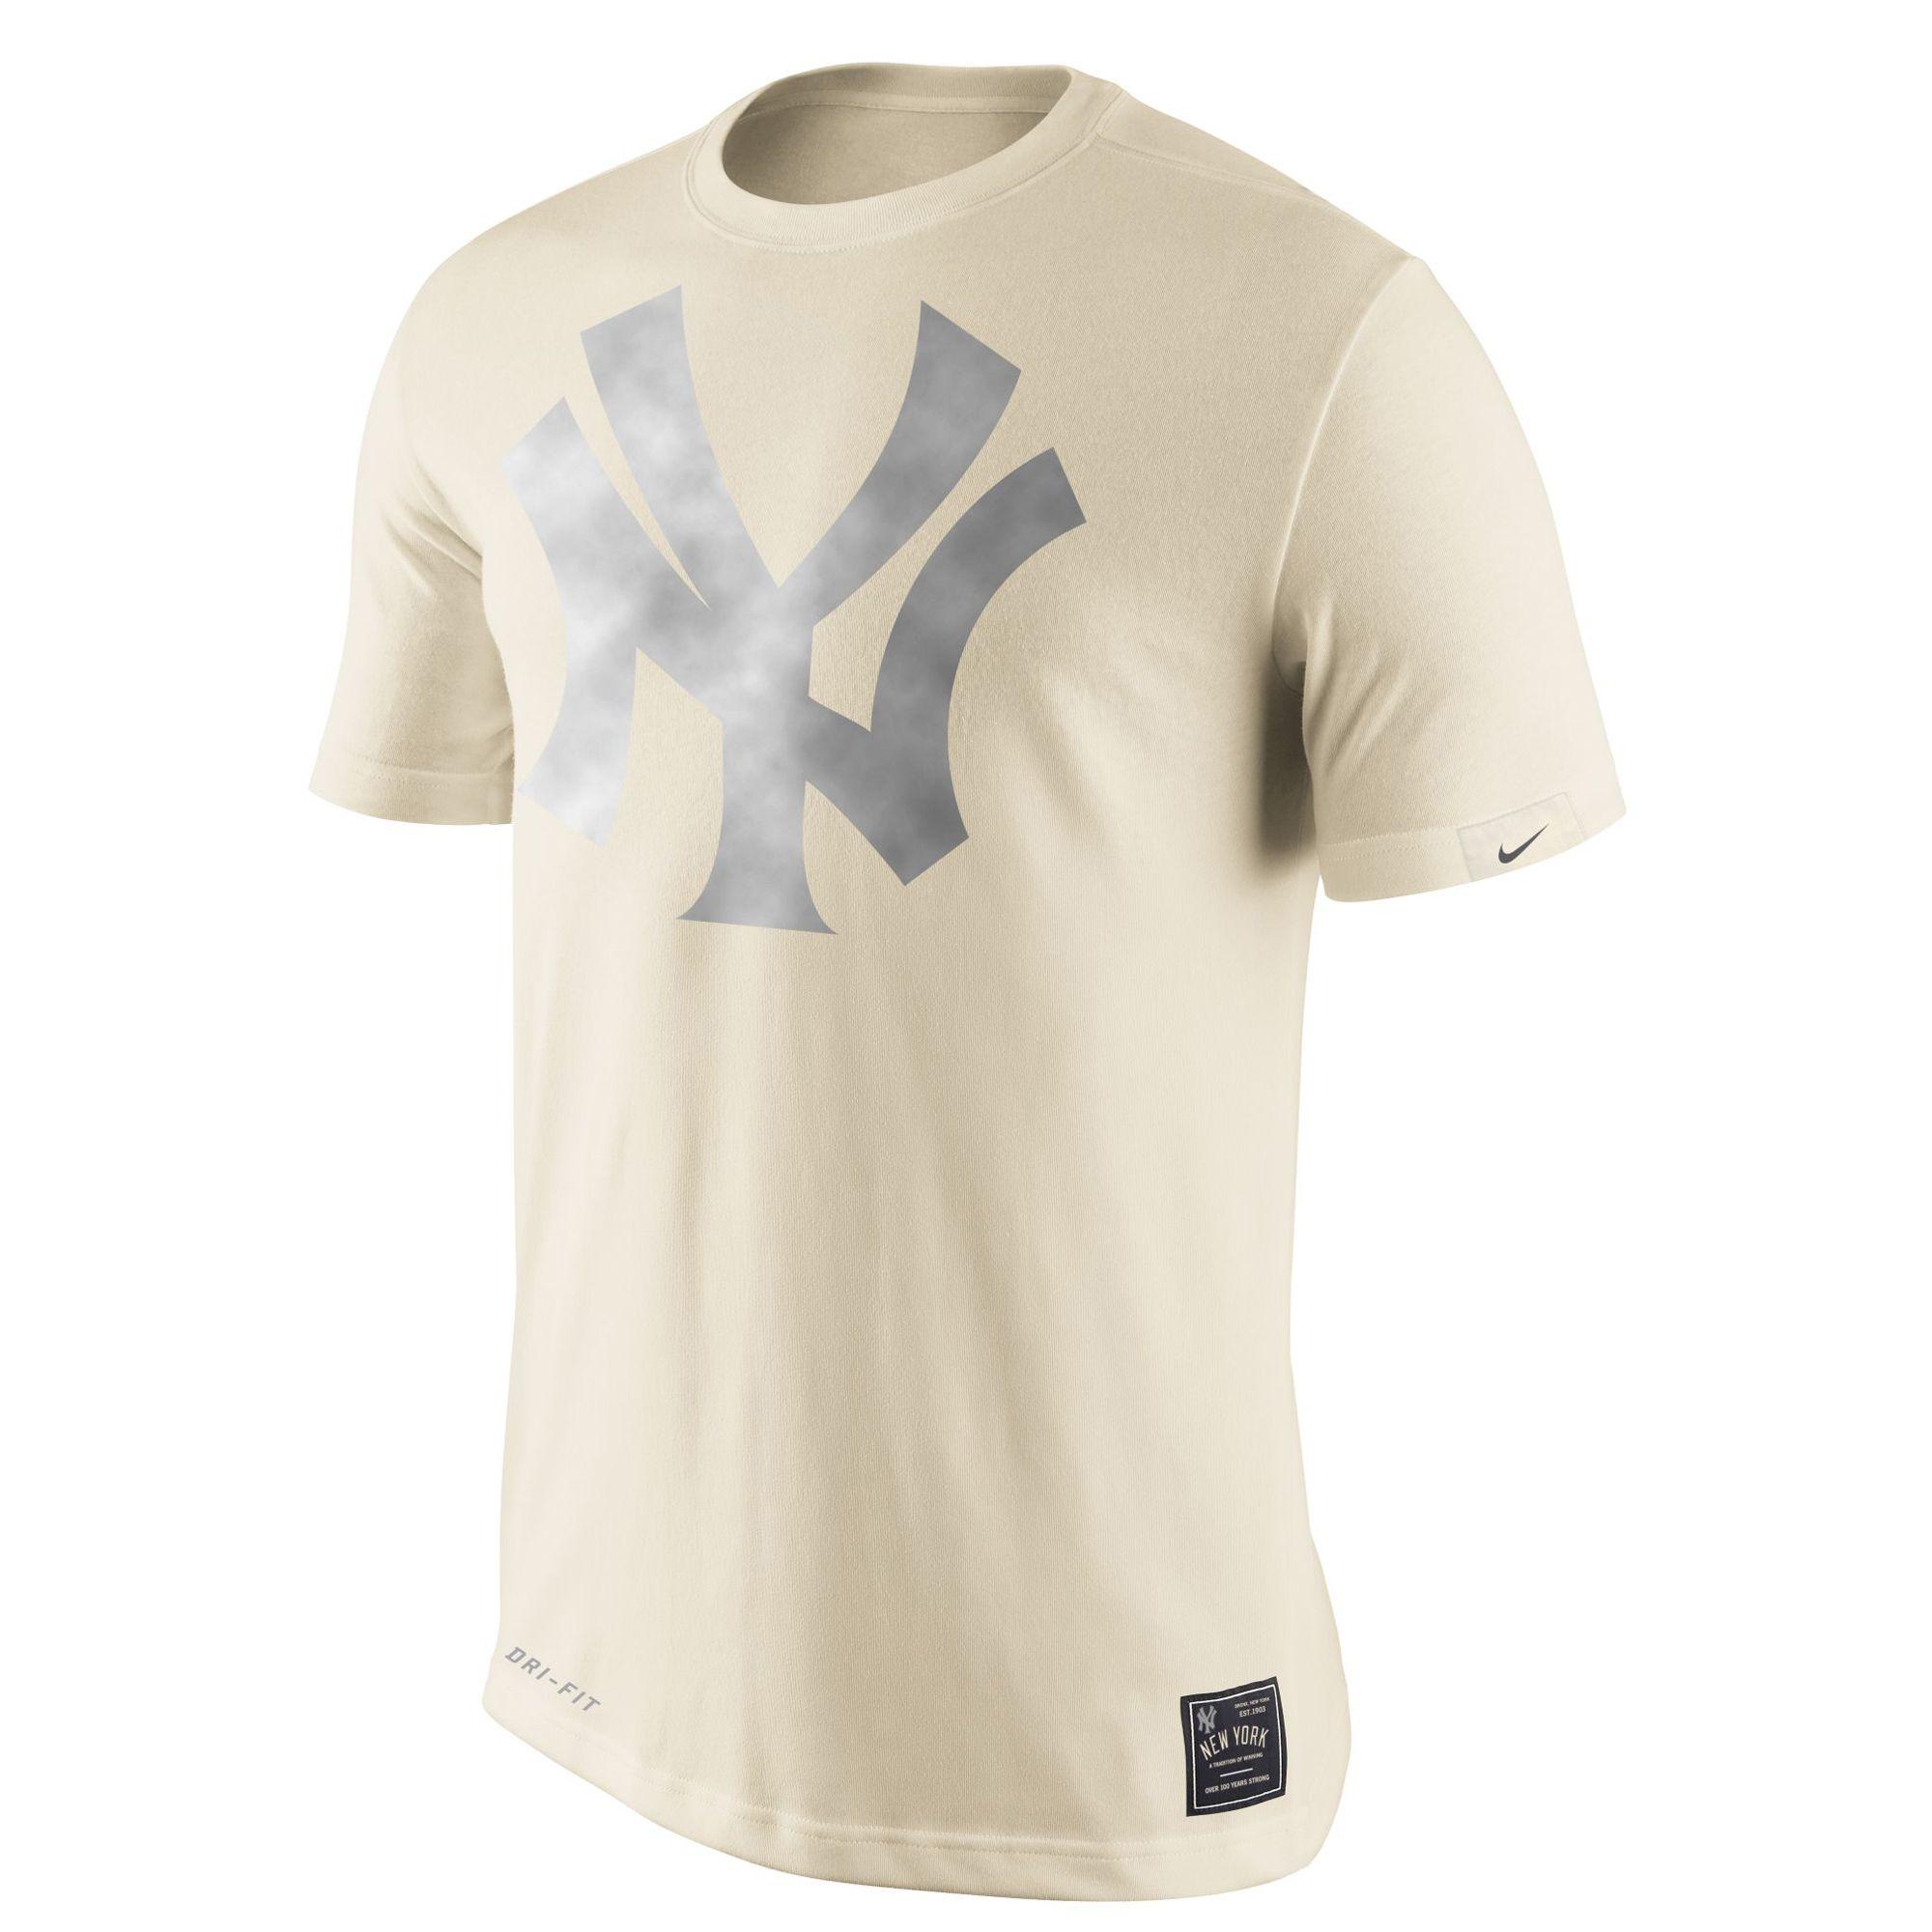 Mlb New York Yankees Nike Metallic Logo Performance T Shirt Cream New York Yankees Mens Baseball Tee Mens Tops